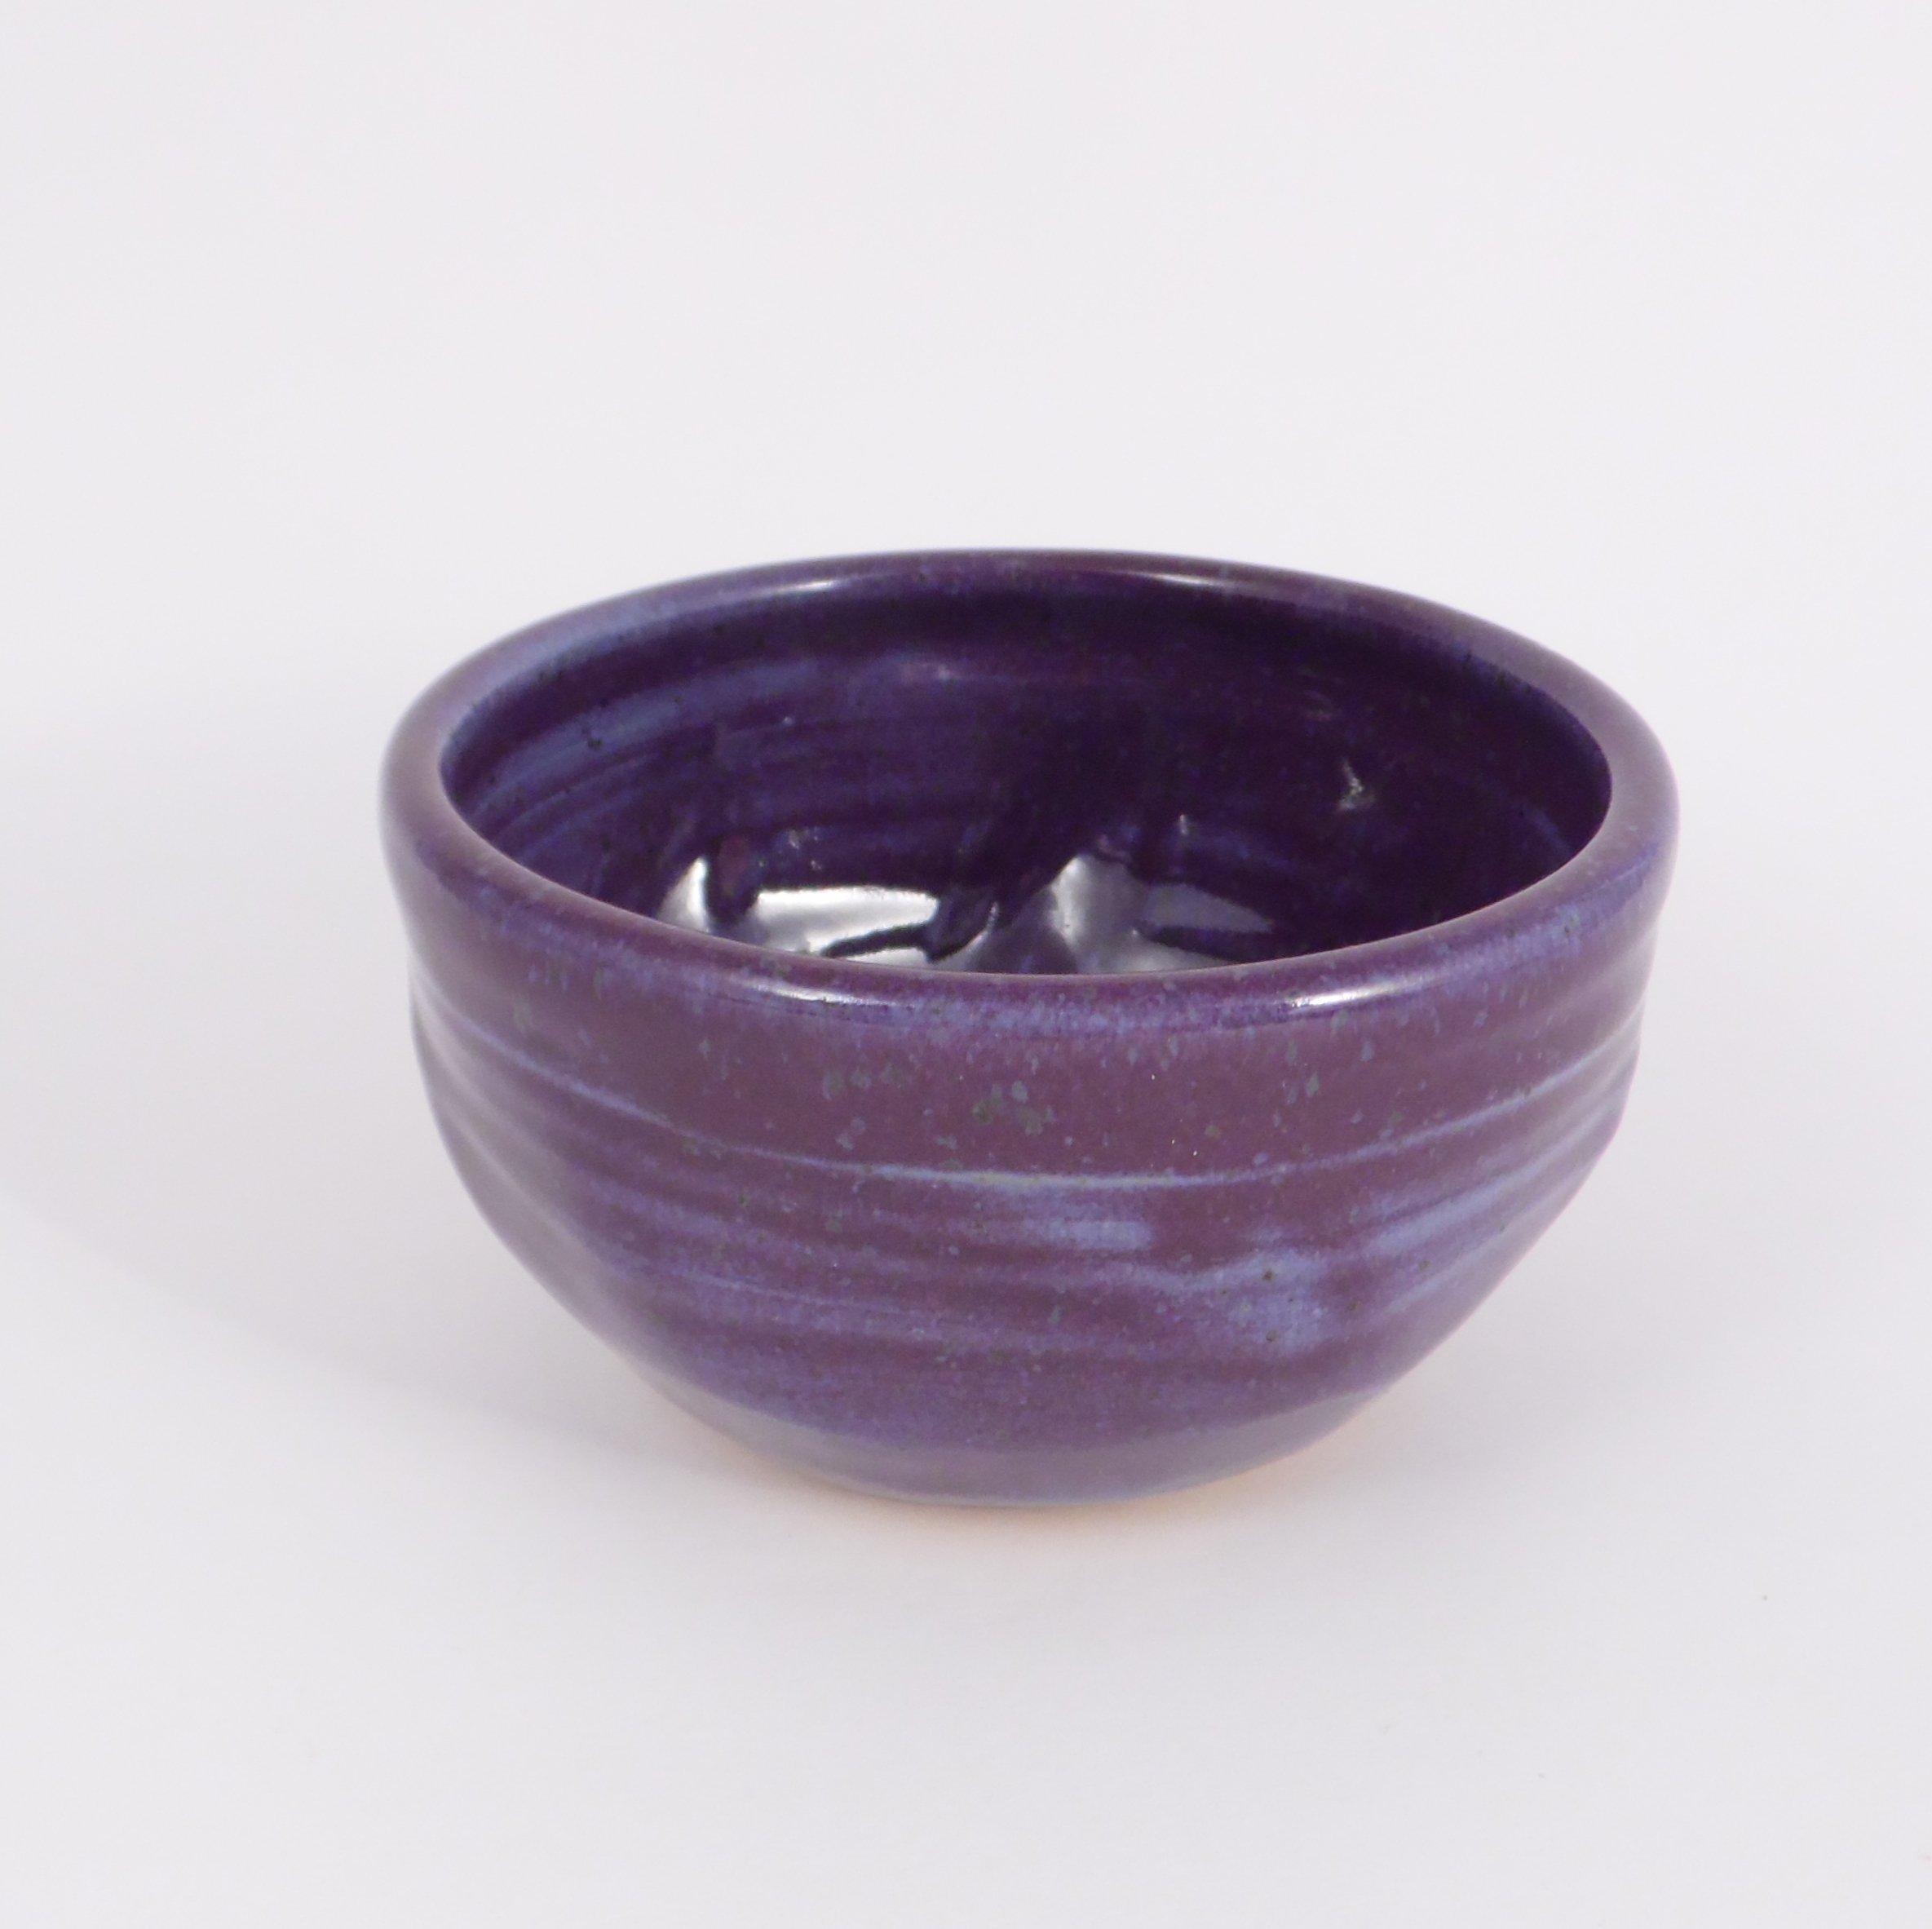 Purple Shaving Bowl - Handmade Pottery